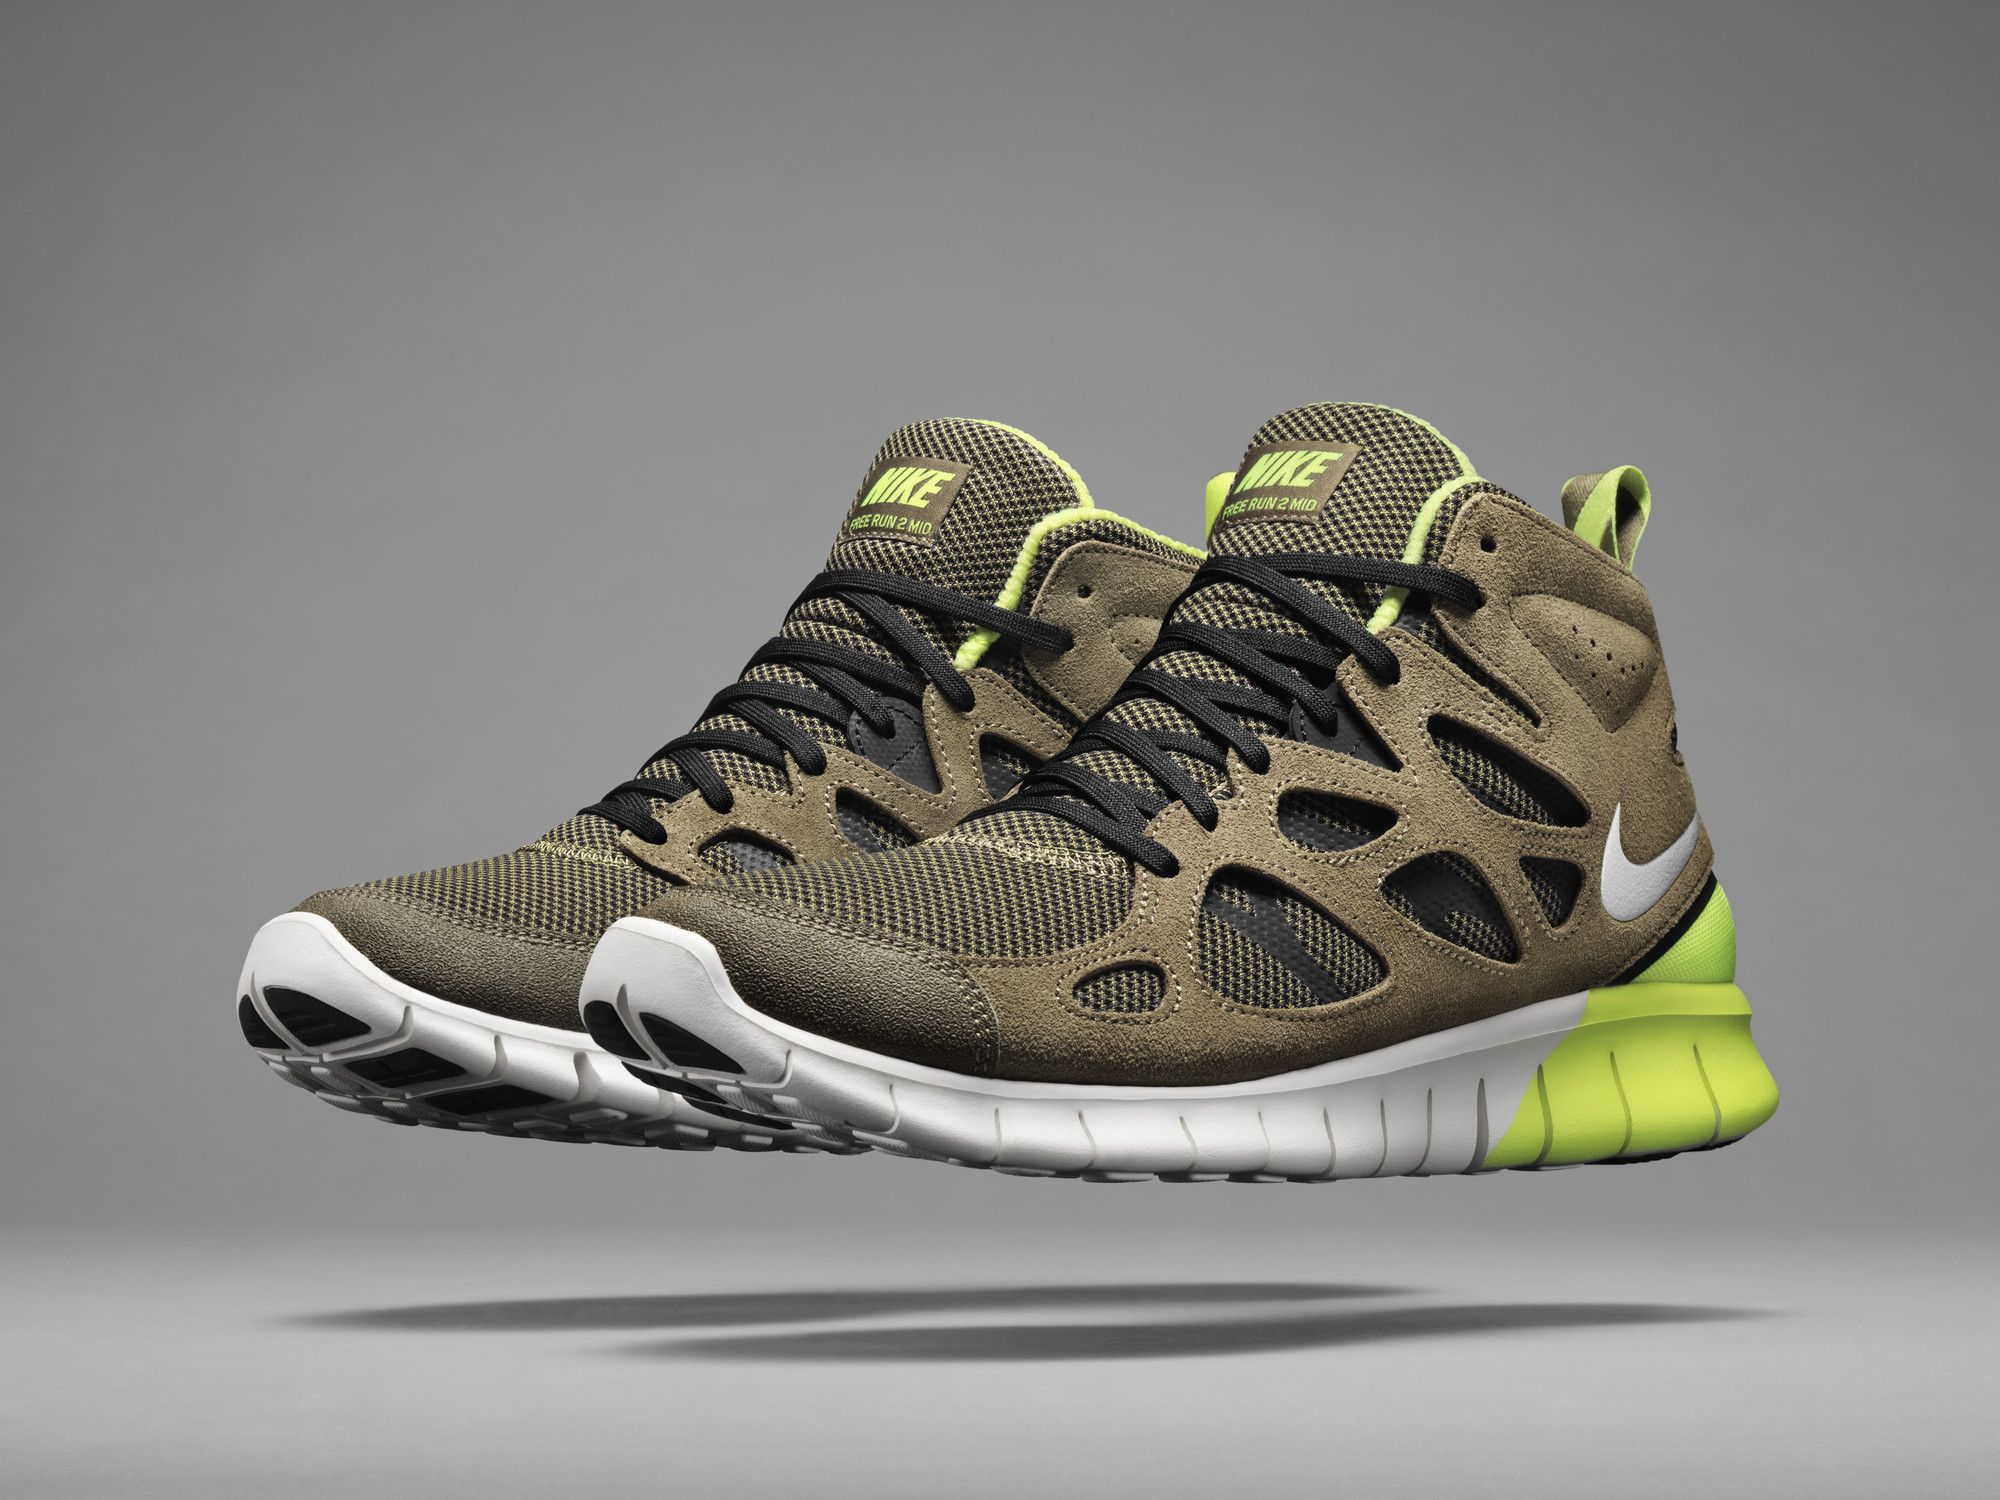 big sale 40268 926b0 Ho13 NSW Sneakerboot M Free 3QFront V1 Nike Sportswear, Sneaker Boots, Nike  Free Run 2, Nike Running, Nike